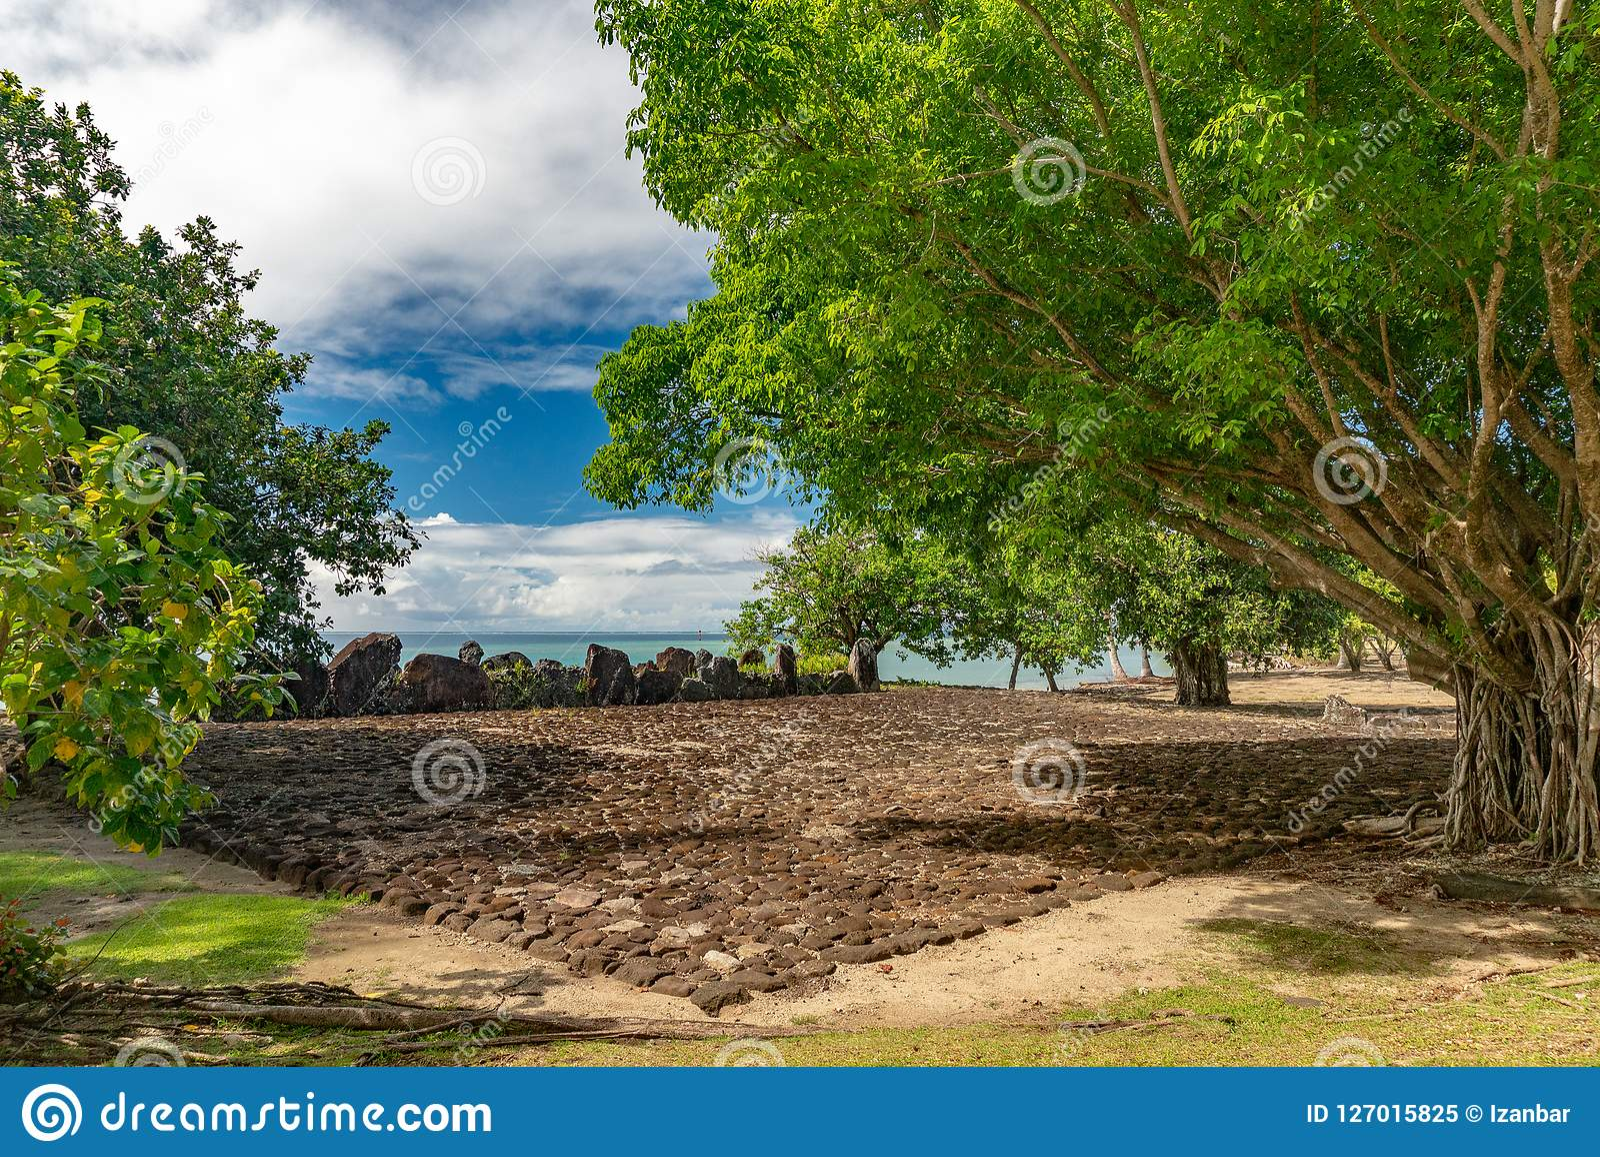 Taputapuatea Marae archäologischer Fundstätte Raiatea-Französisch-Polynesien-UNESCO